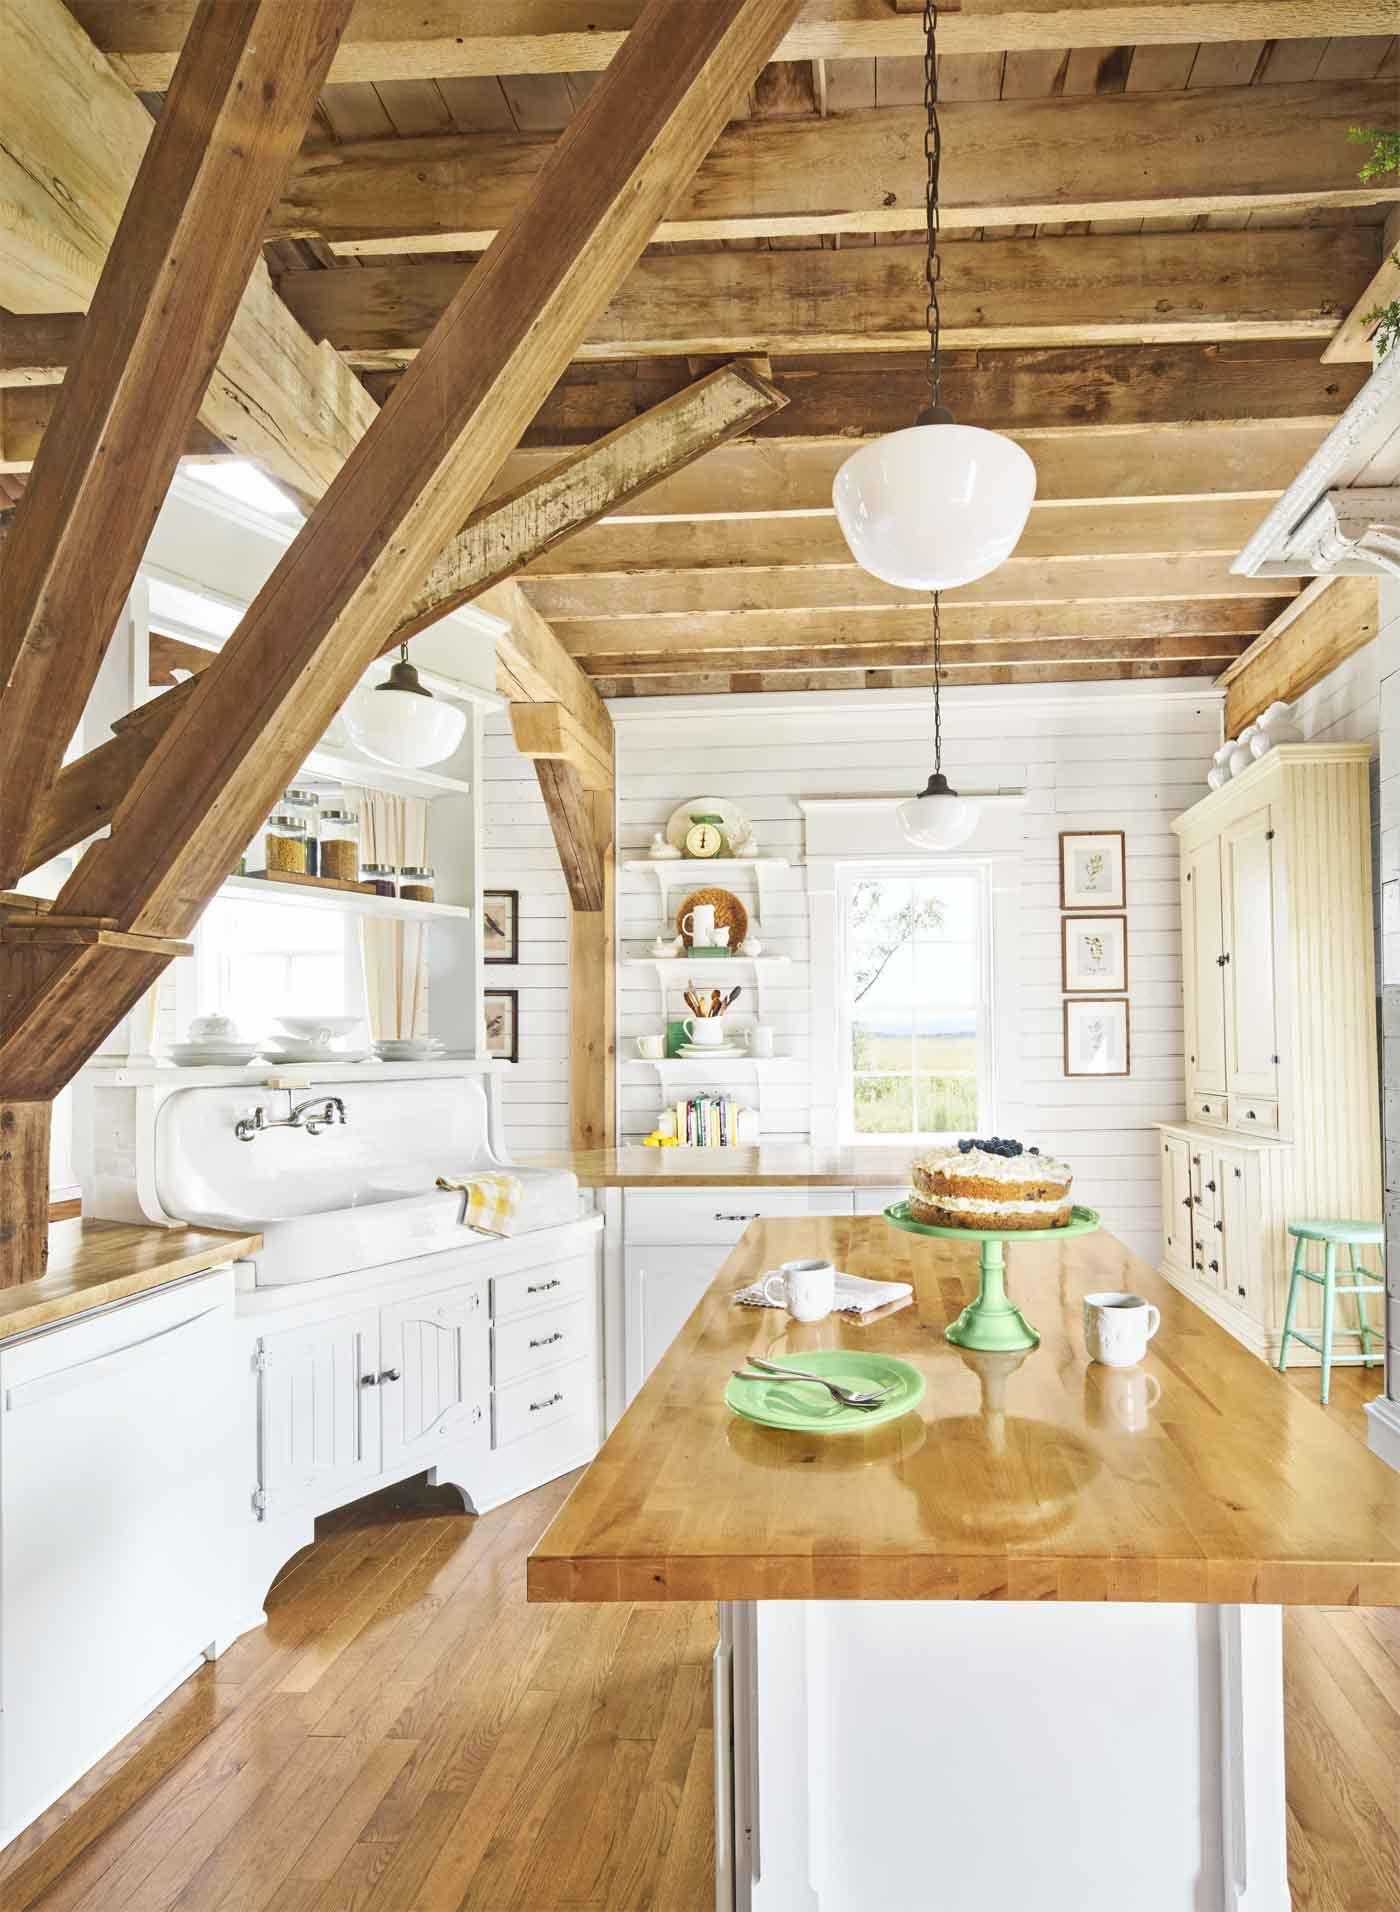 100 Kitchen Design Ideas of Country Kitchen Decorating